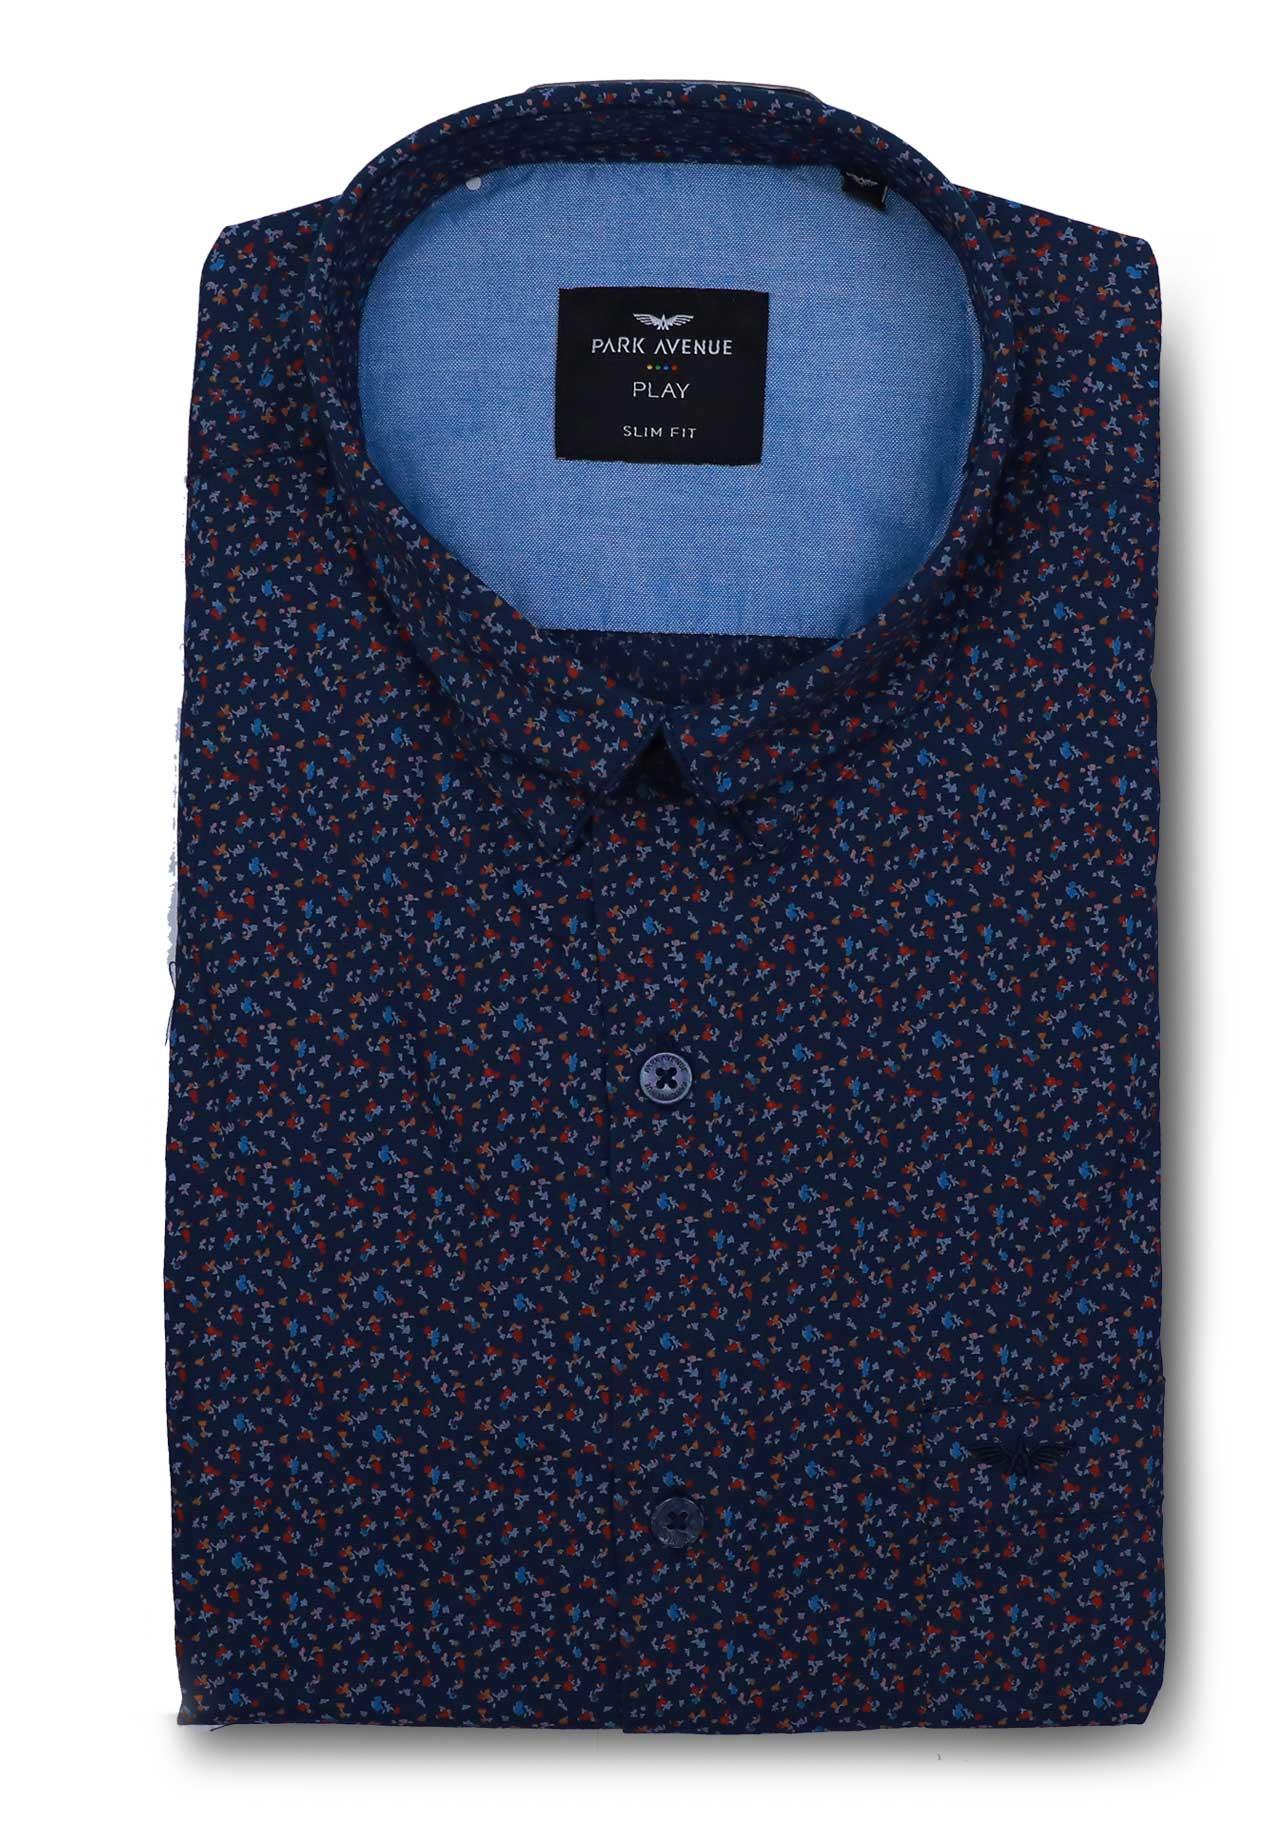 Park Avenue PCSA01886-N4 Mens Shirt, Size 42